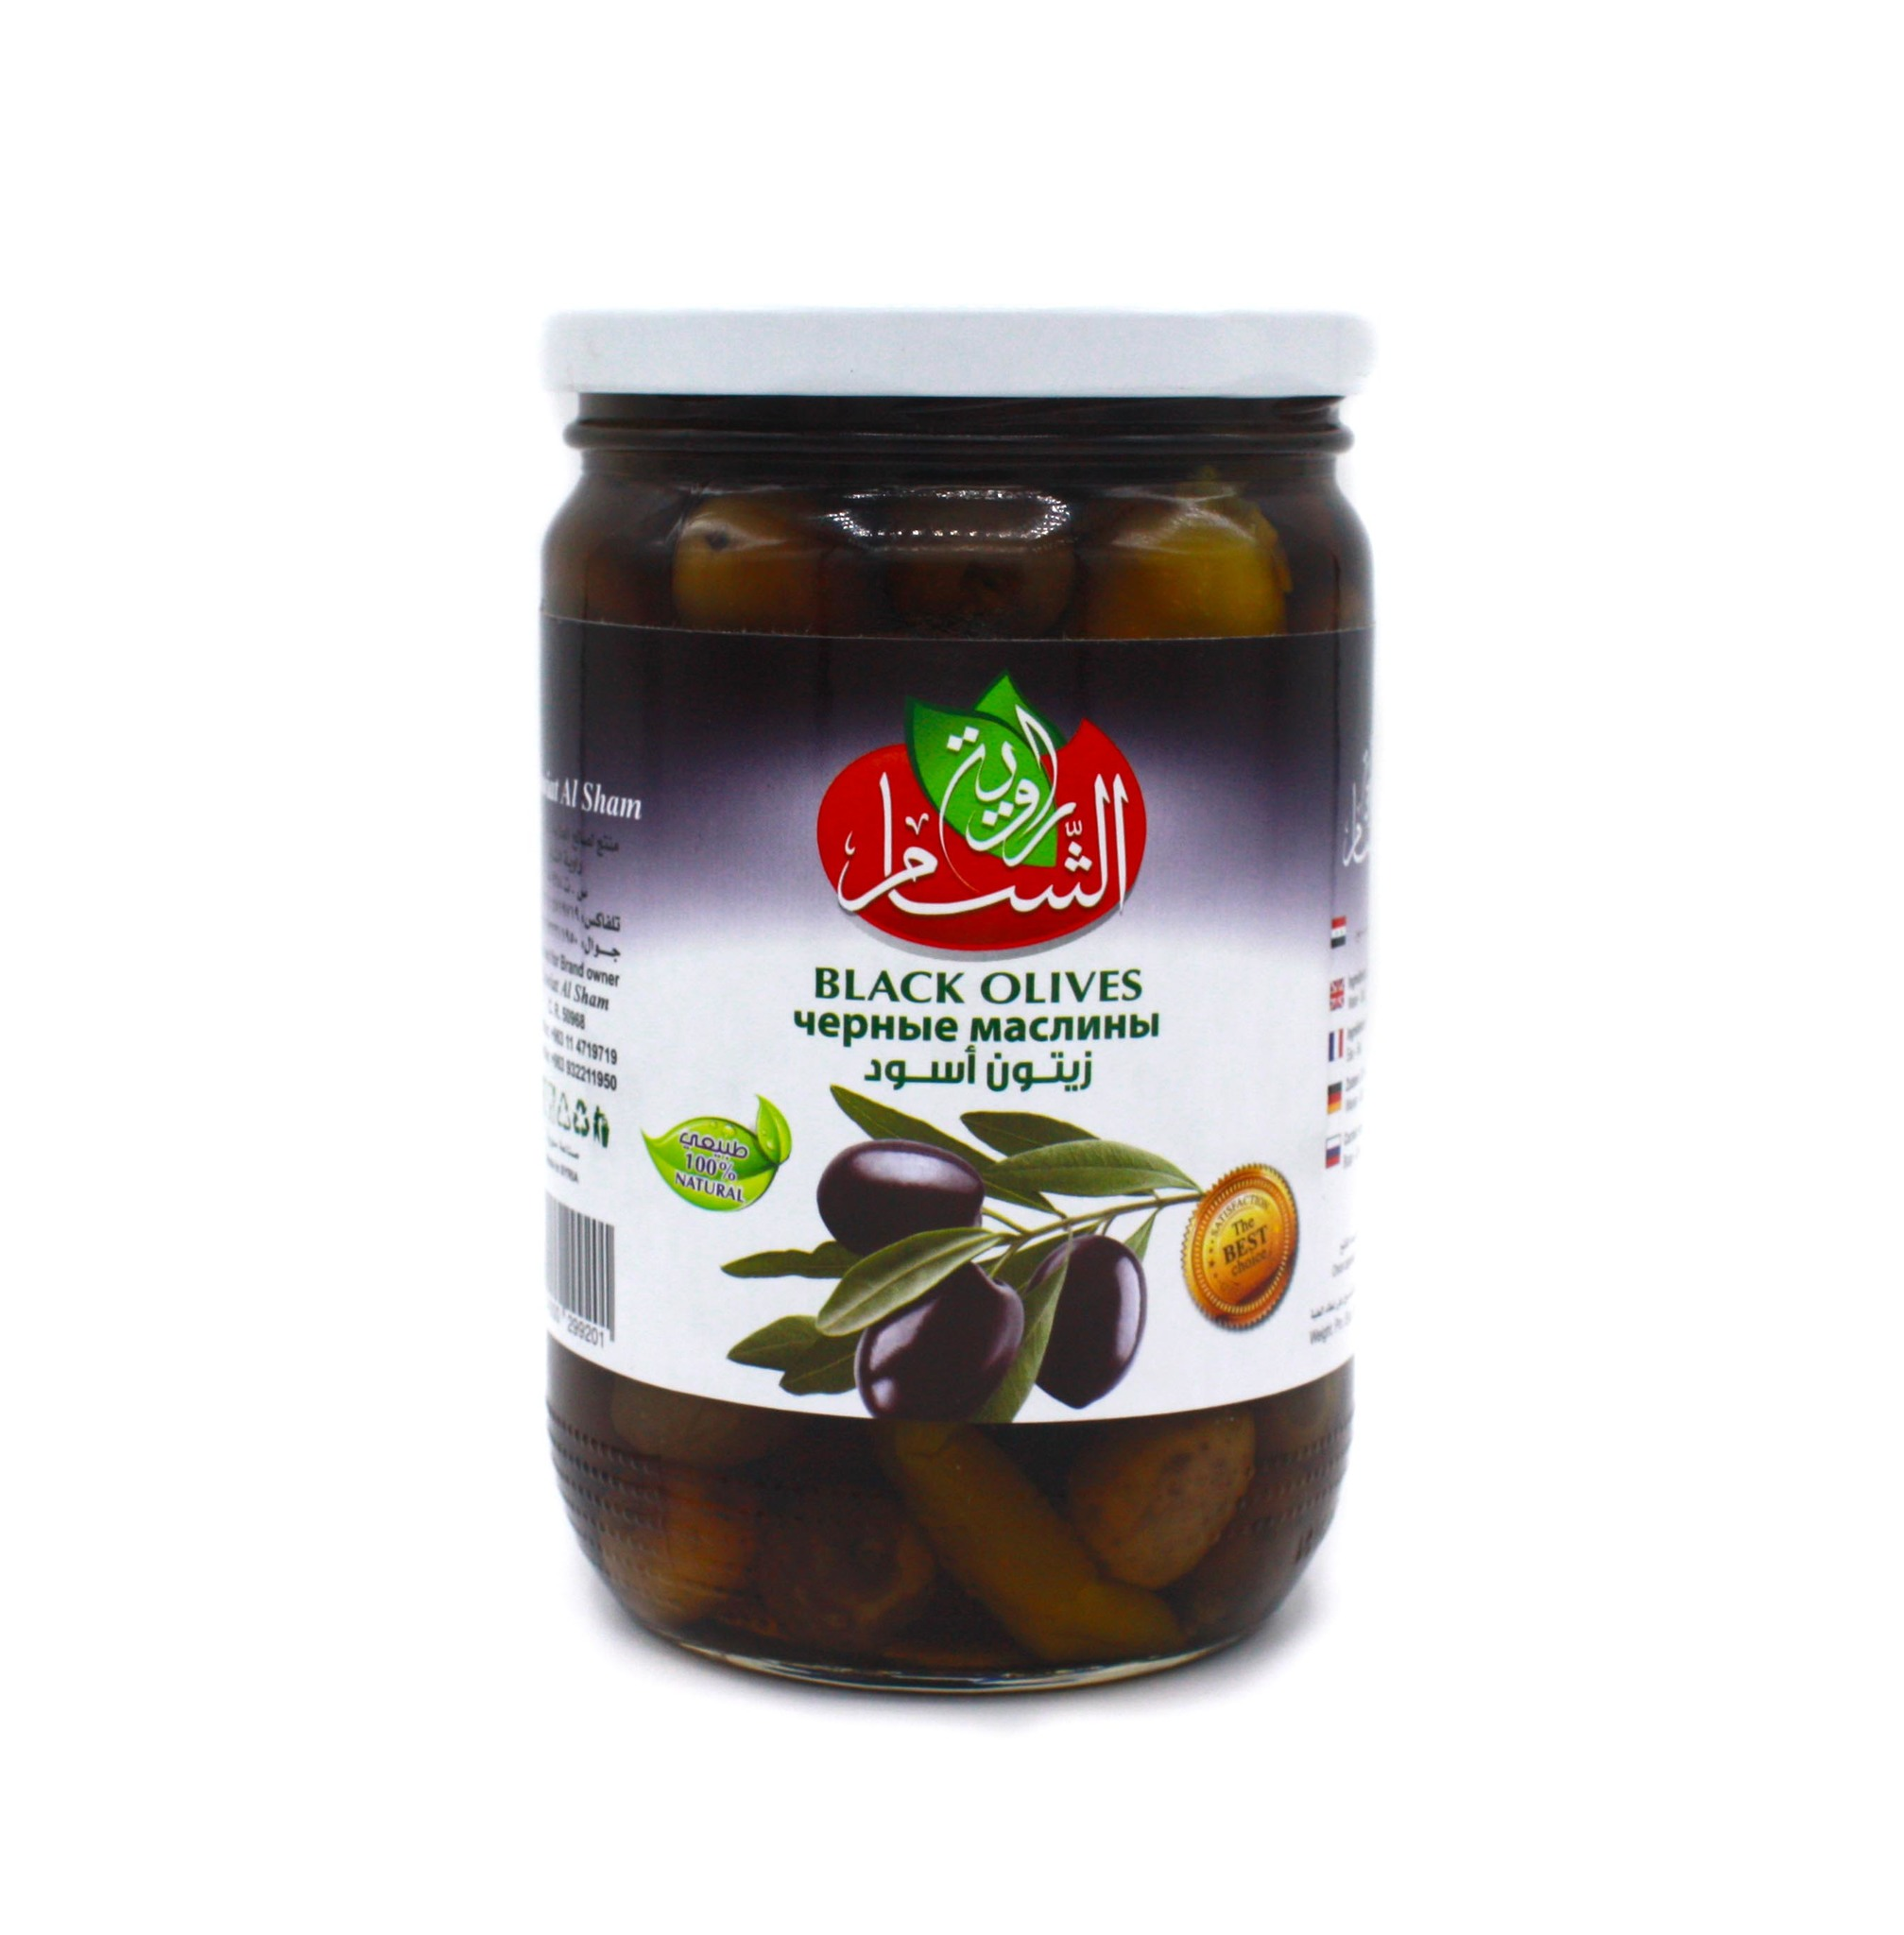 Маслины Rawiat Al Sham, 400 г import_files_a2_a24b6a3b67e911e89d8f448a5b3752ae_da0404c7657a11e8a996484d7ecee297.jpg